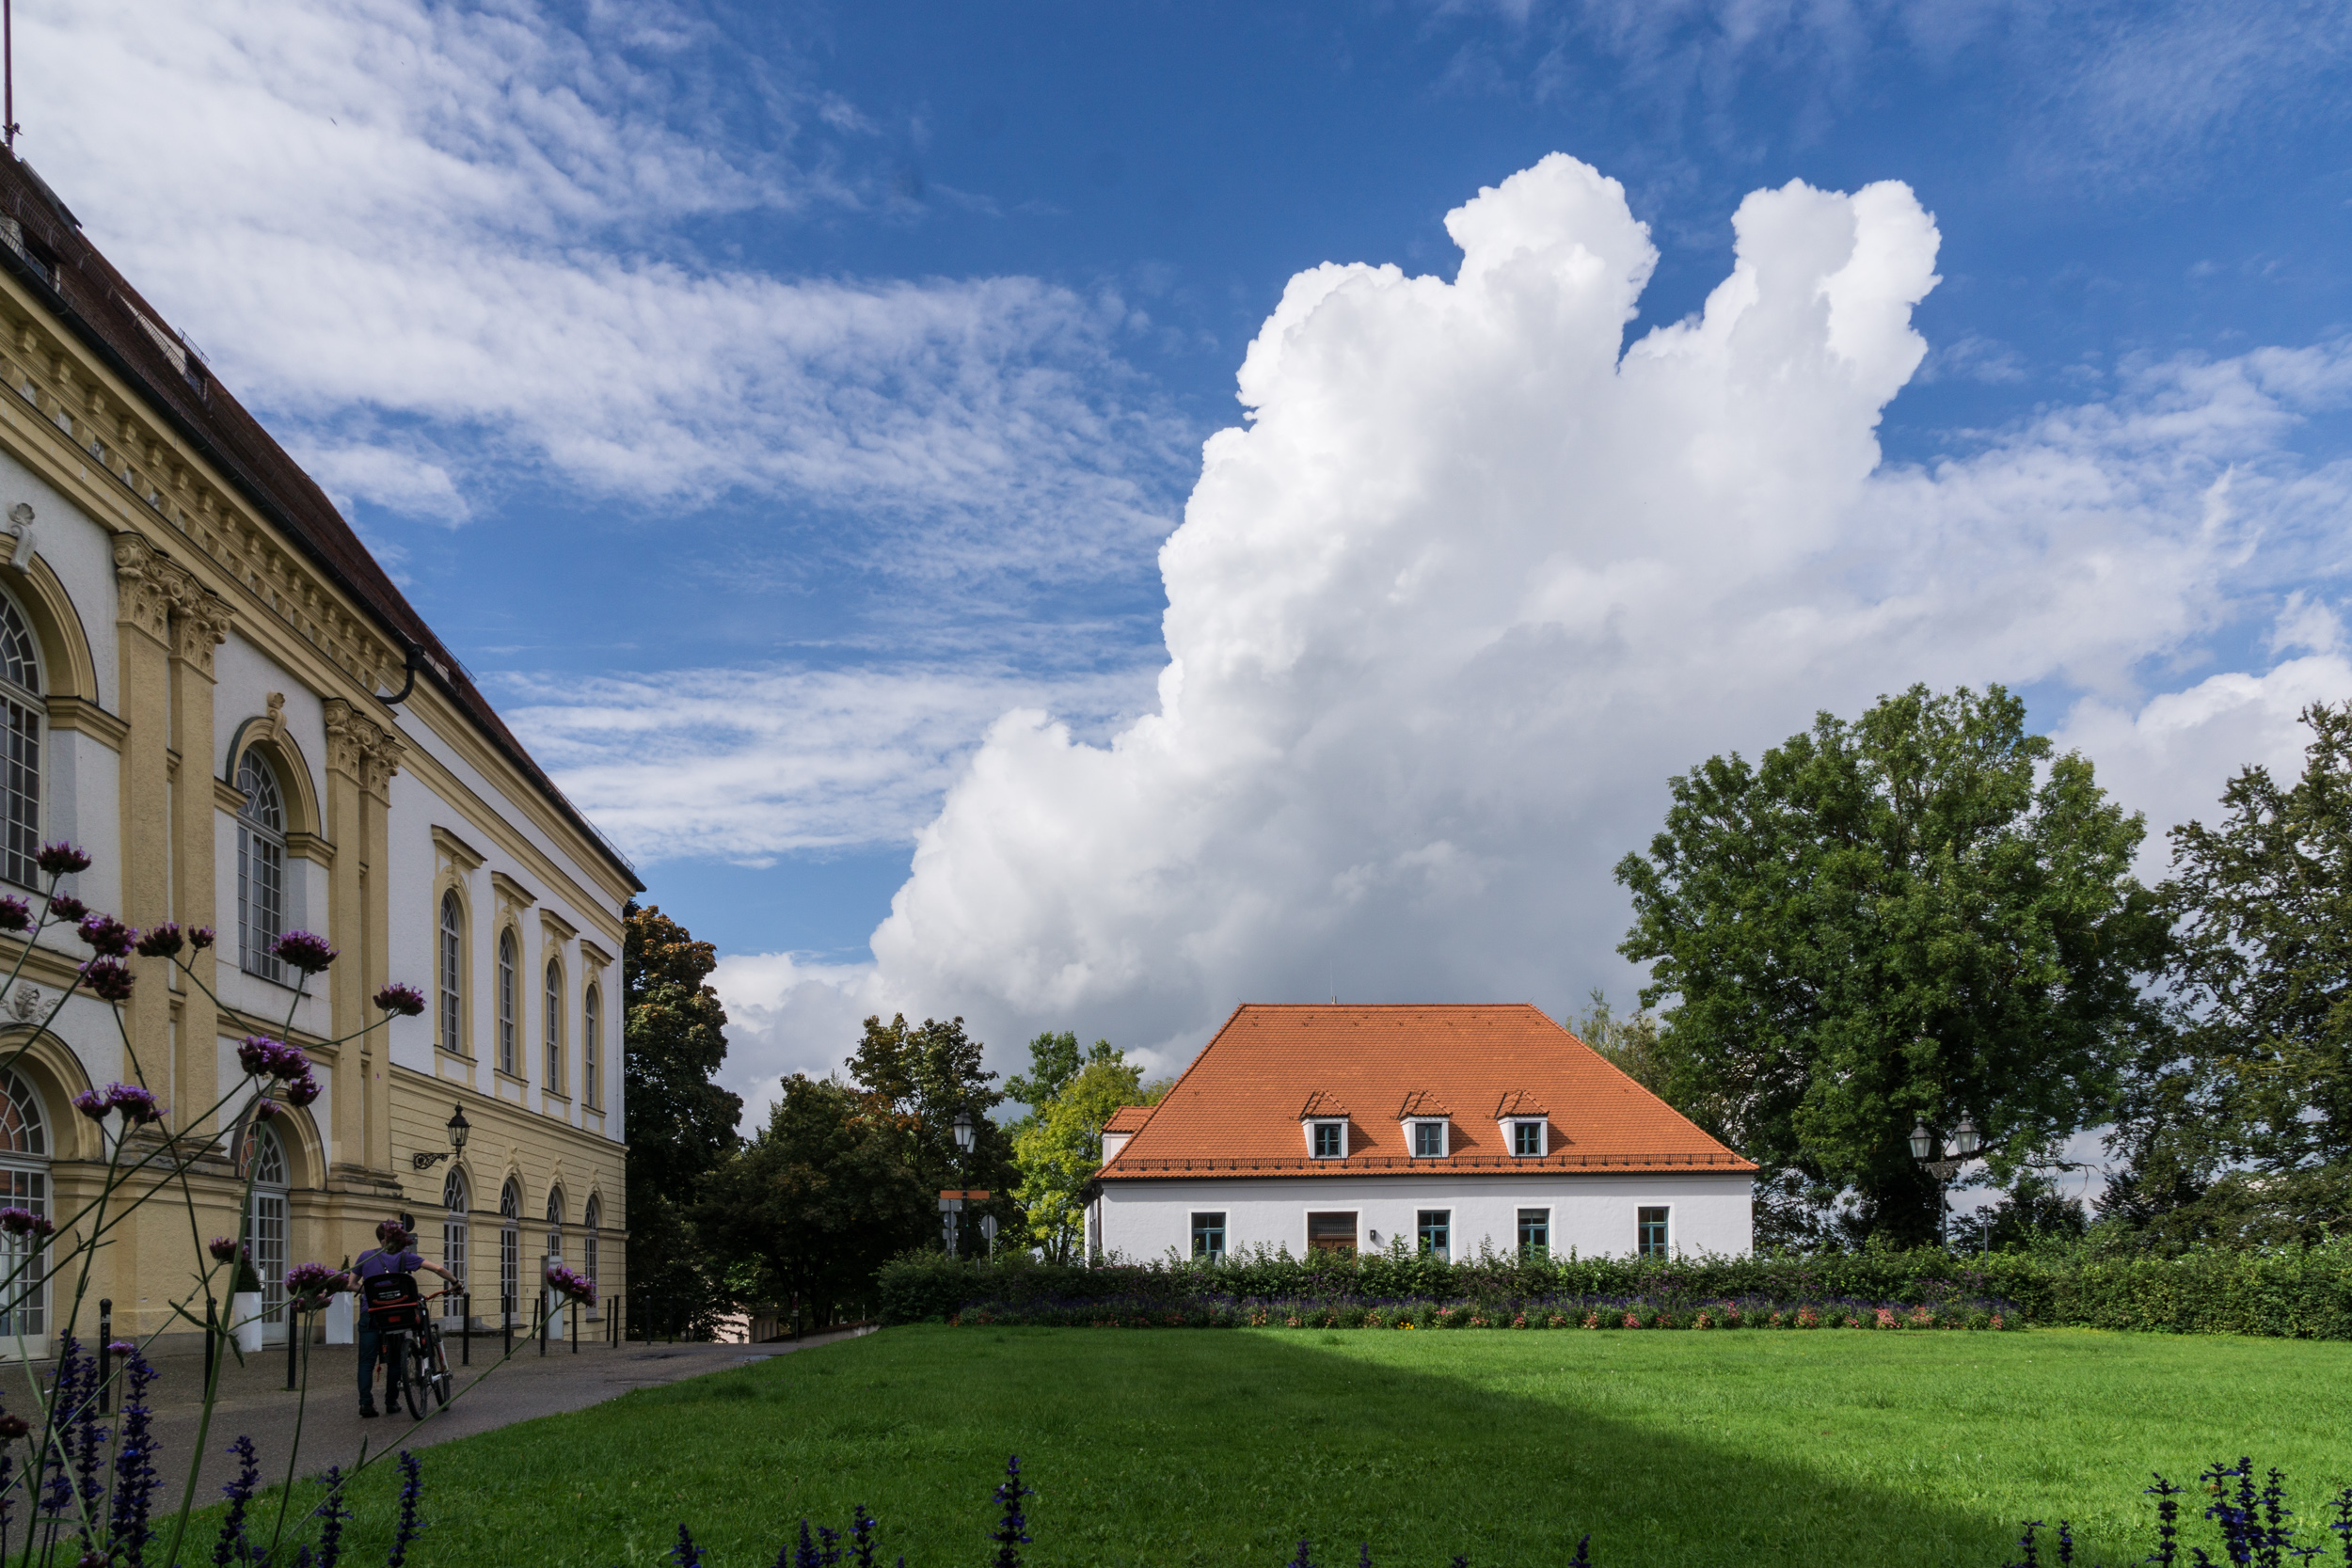 Schloss und Amtsgericht Dachau